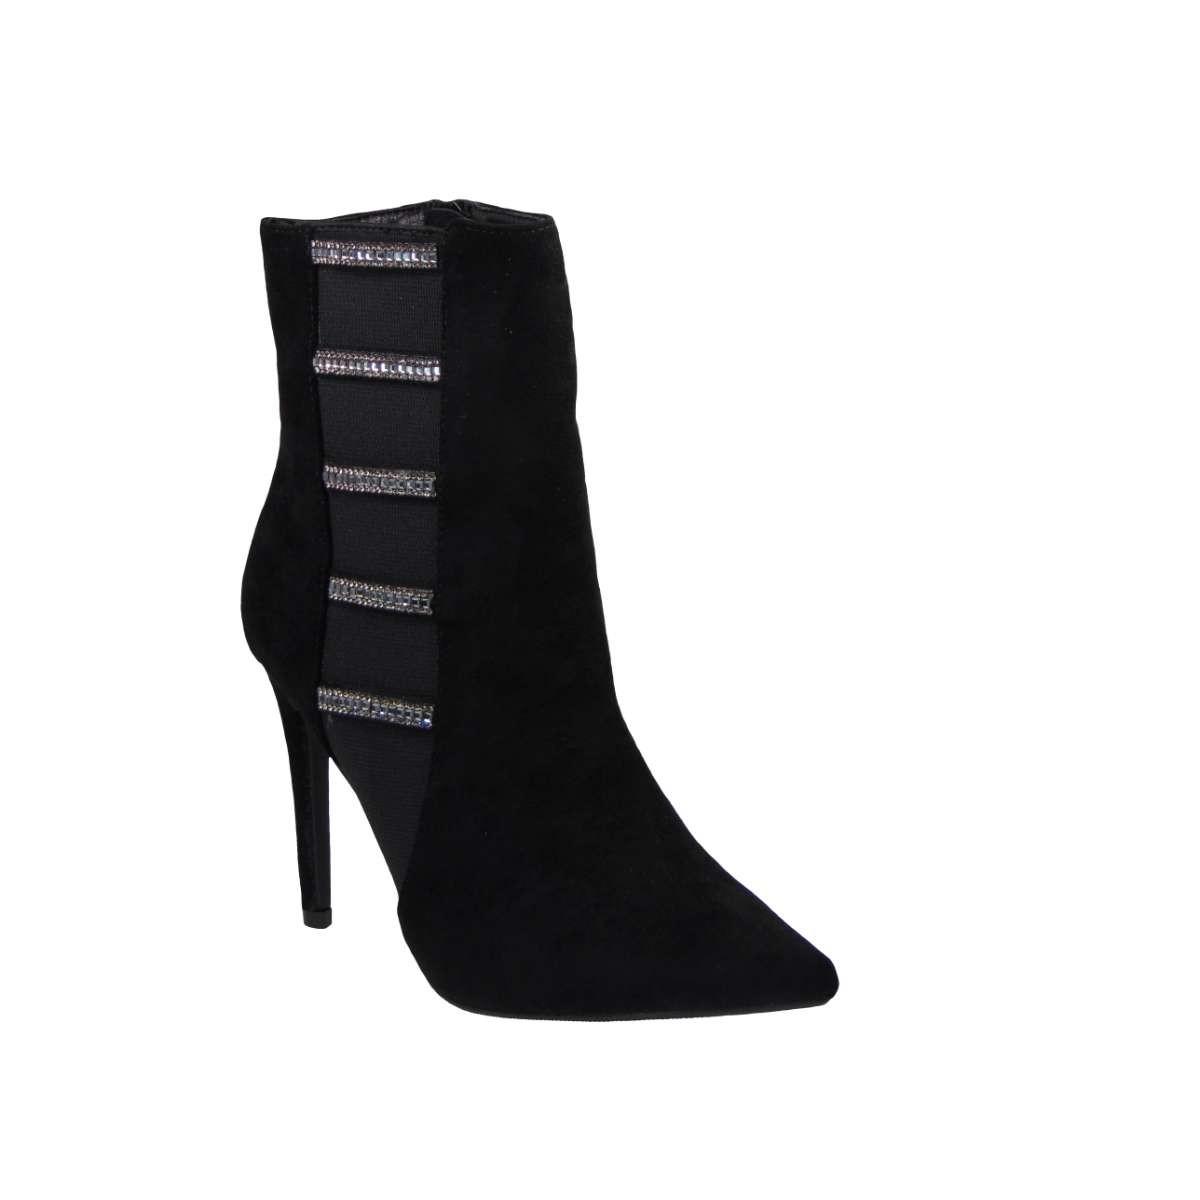 Tsimpolis Shoes C77 Μποτάκι Από Τεχνοκαστόρ Μαύρο